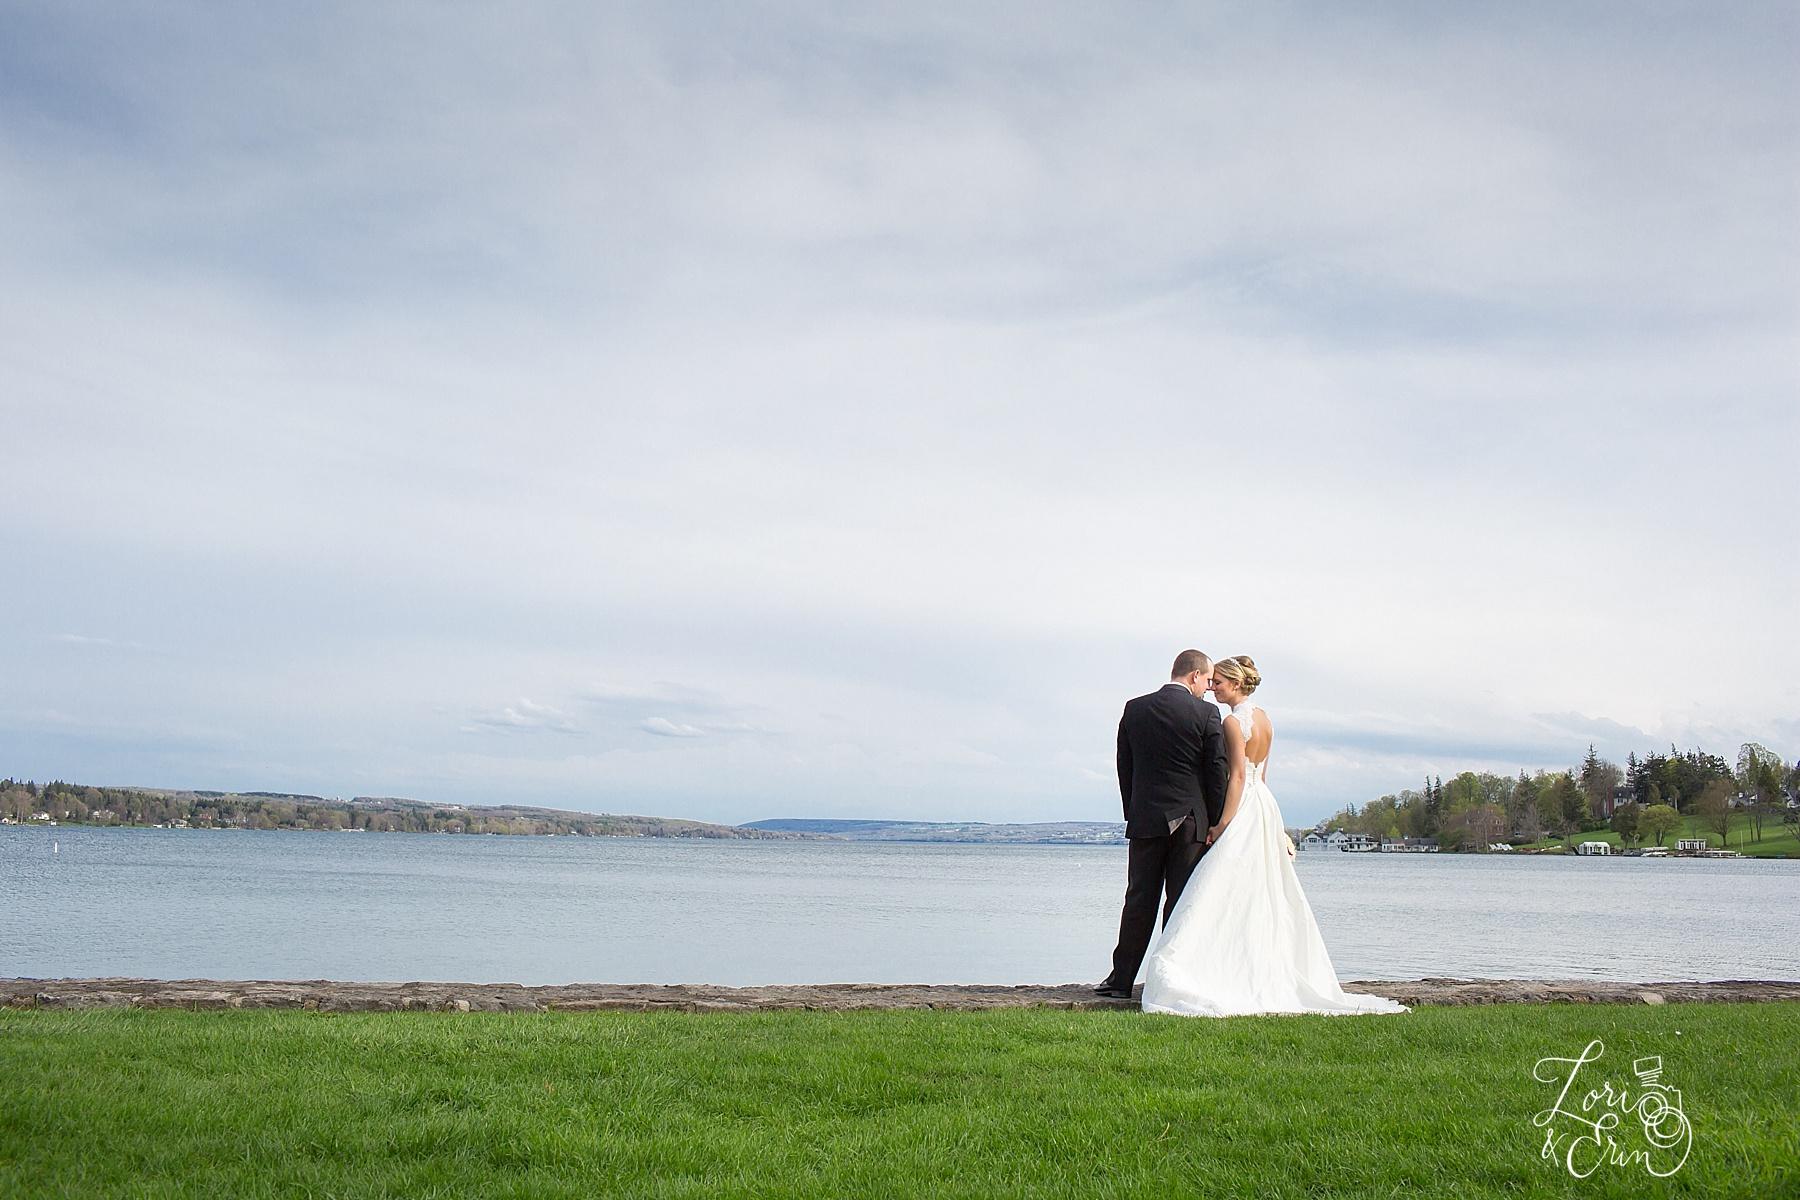 skaneateles wedding photography, skaneateles lake